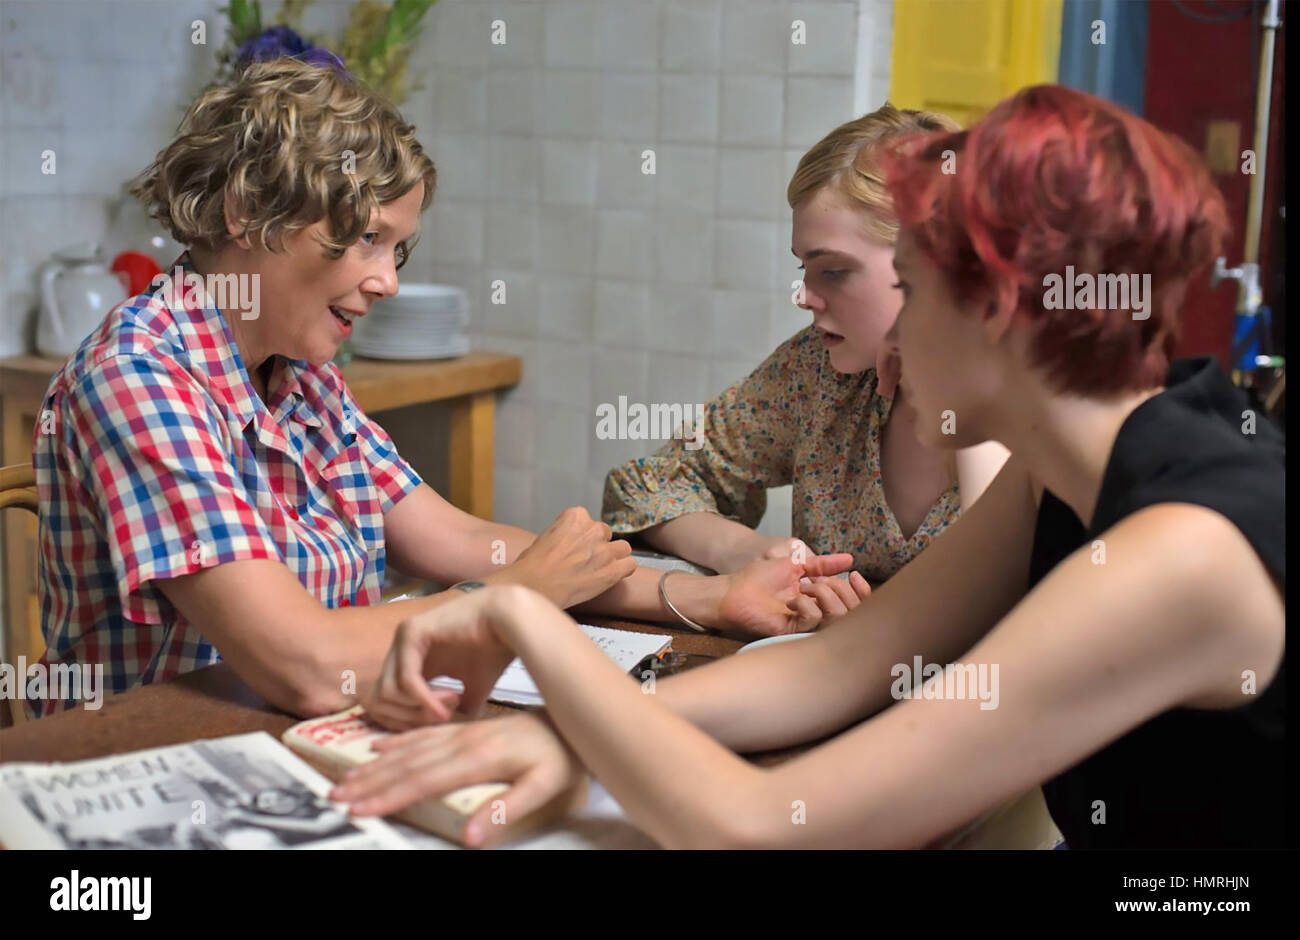 Las mujeres del siglo xx 2016 Annapurna Pictures con de izquierda a derecha: Annette Bening, Elle Fanning, Greta Imagen De Stock